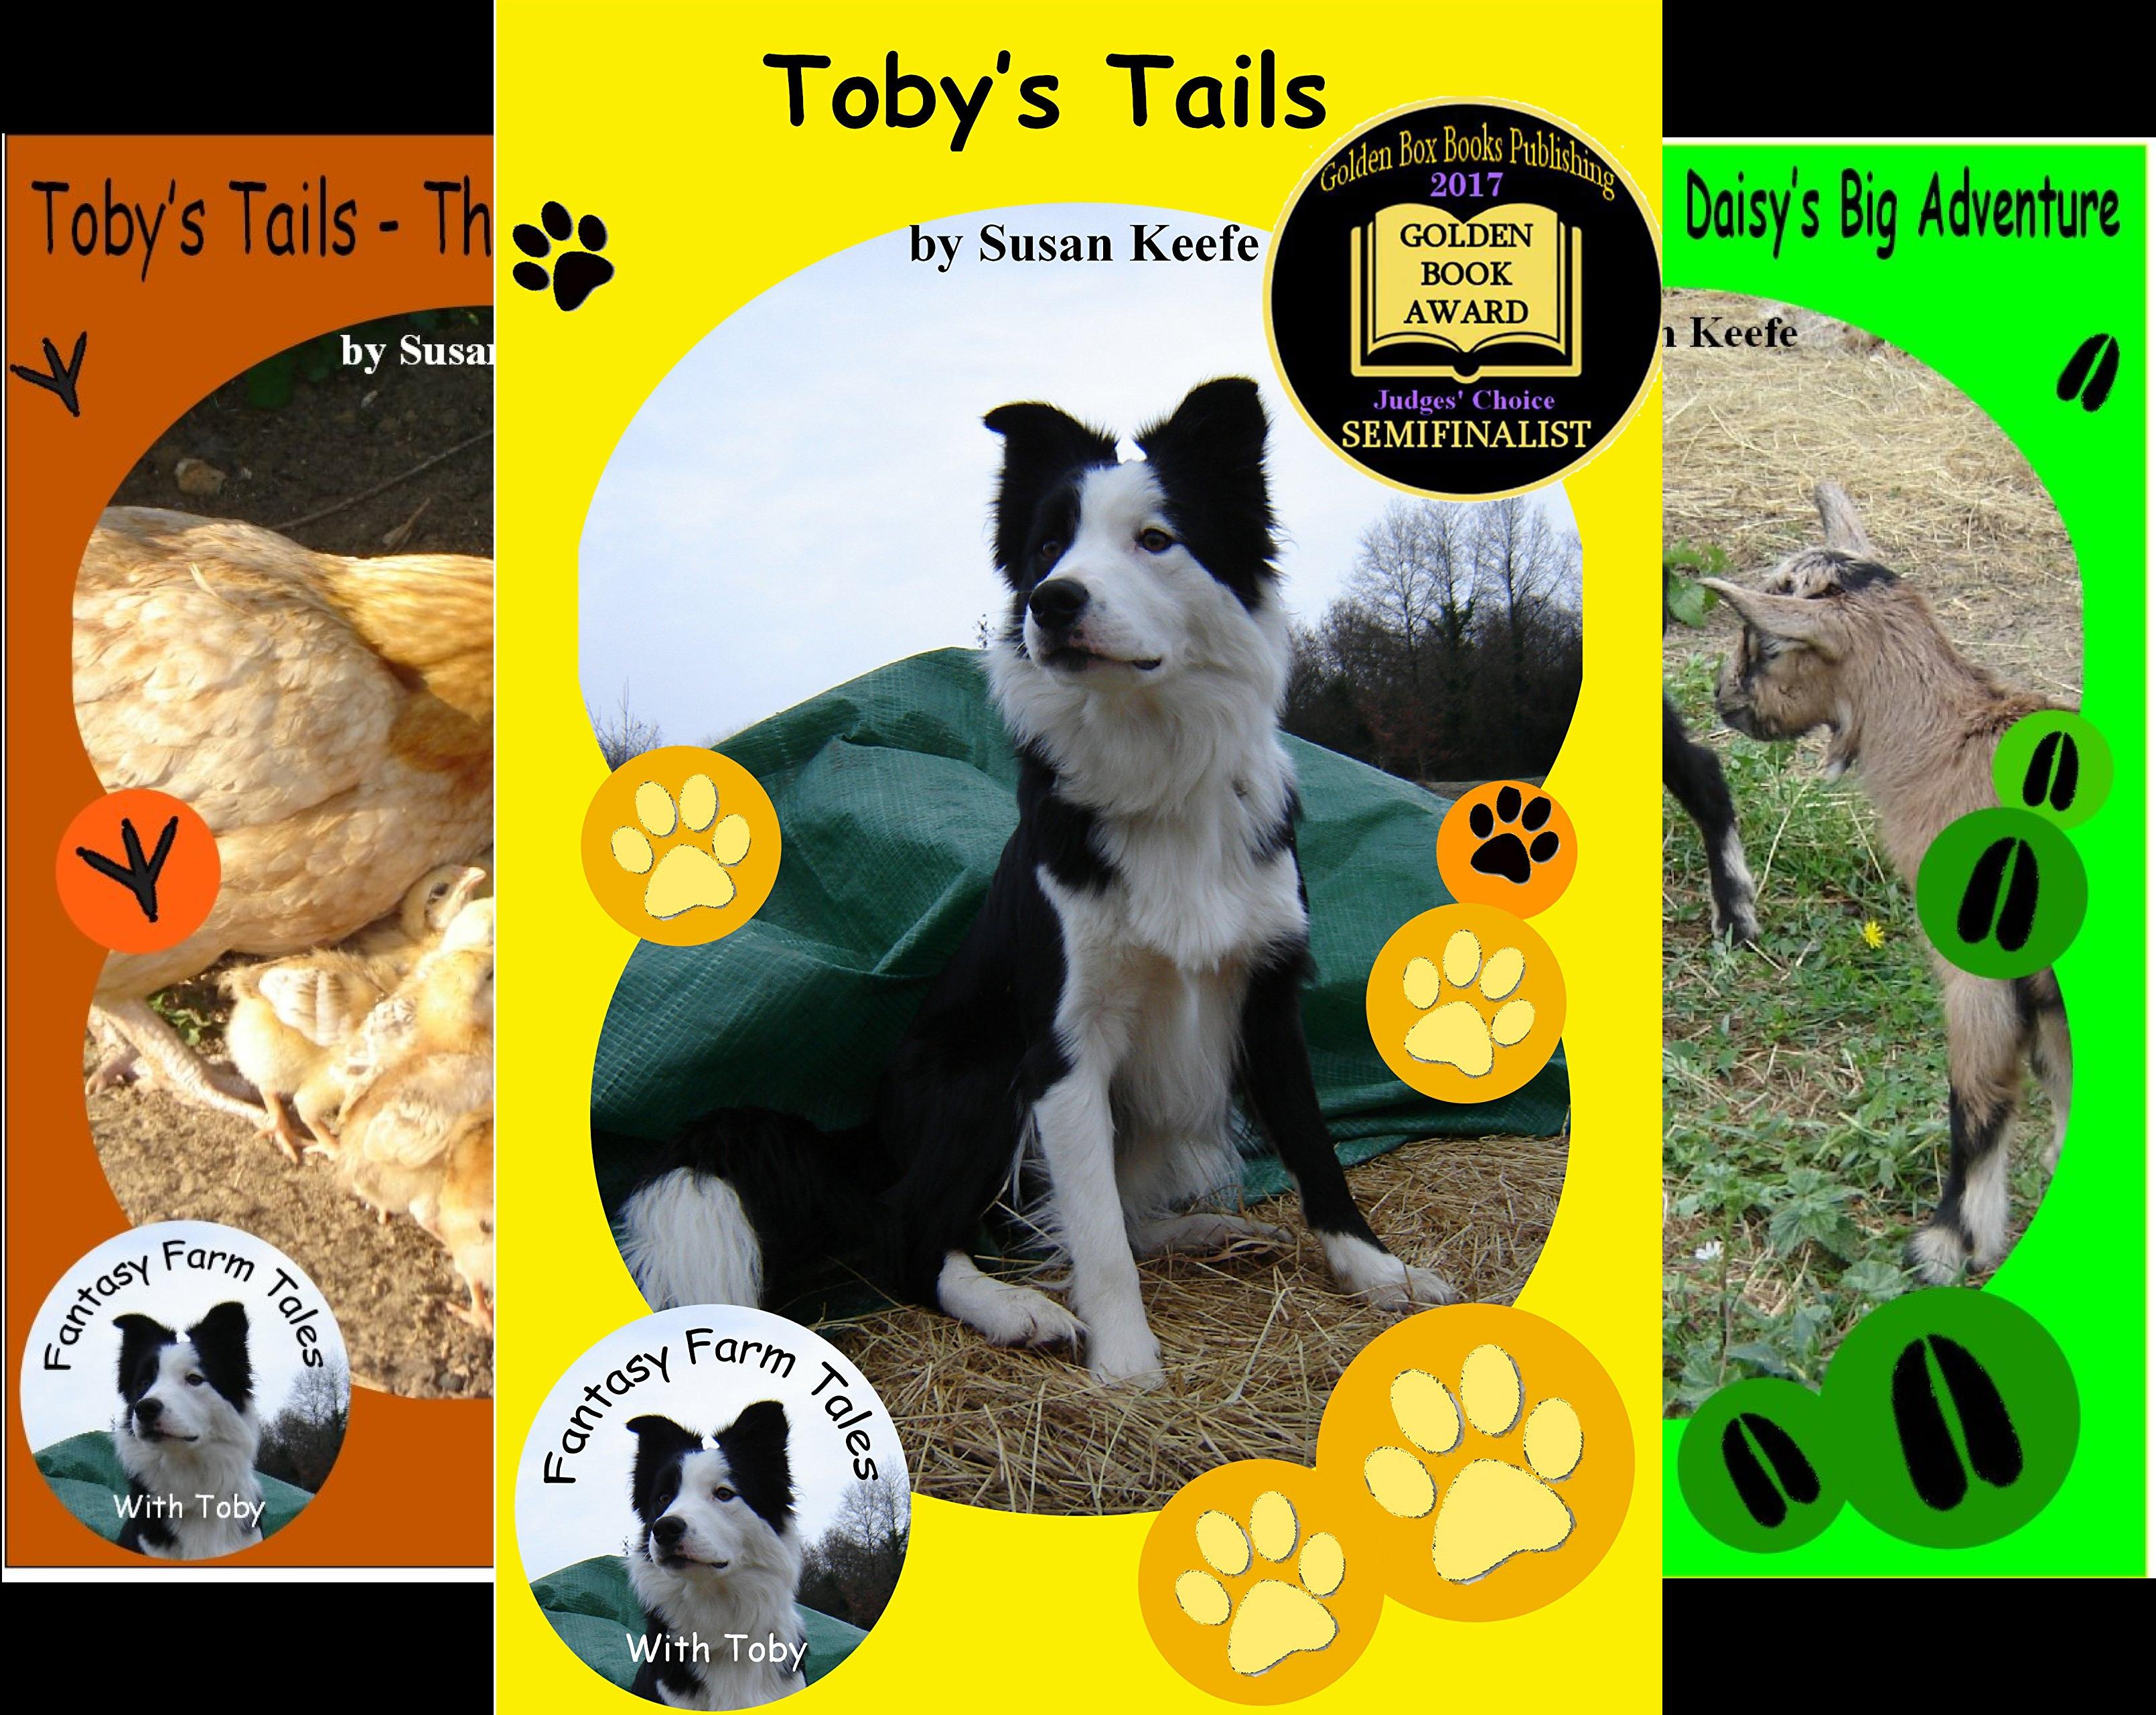 Fantasy Farm Tales (9 Book Series)